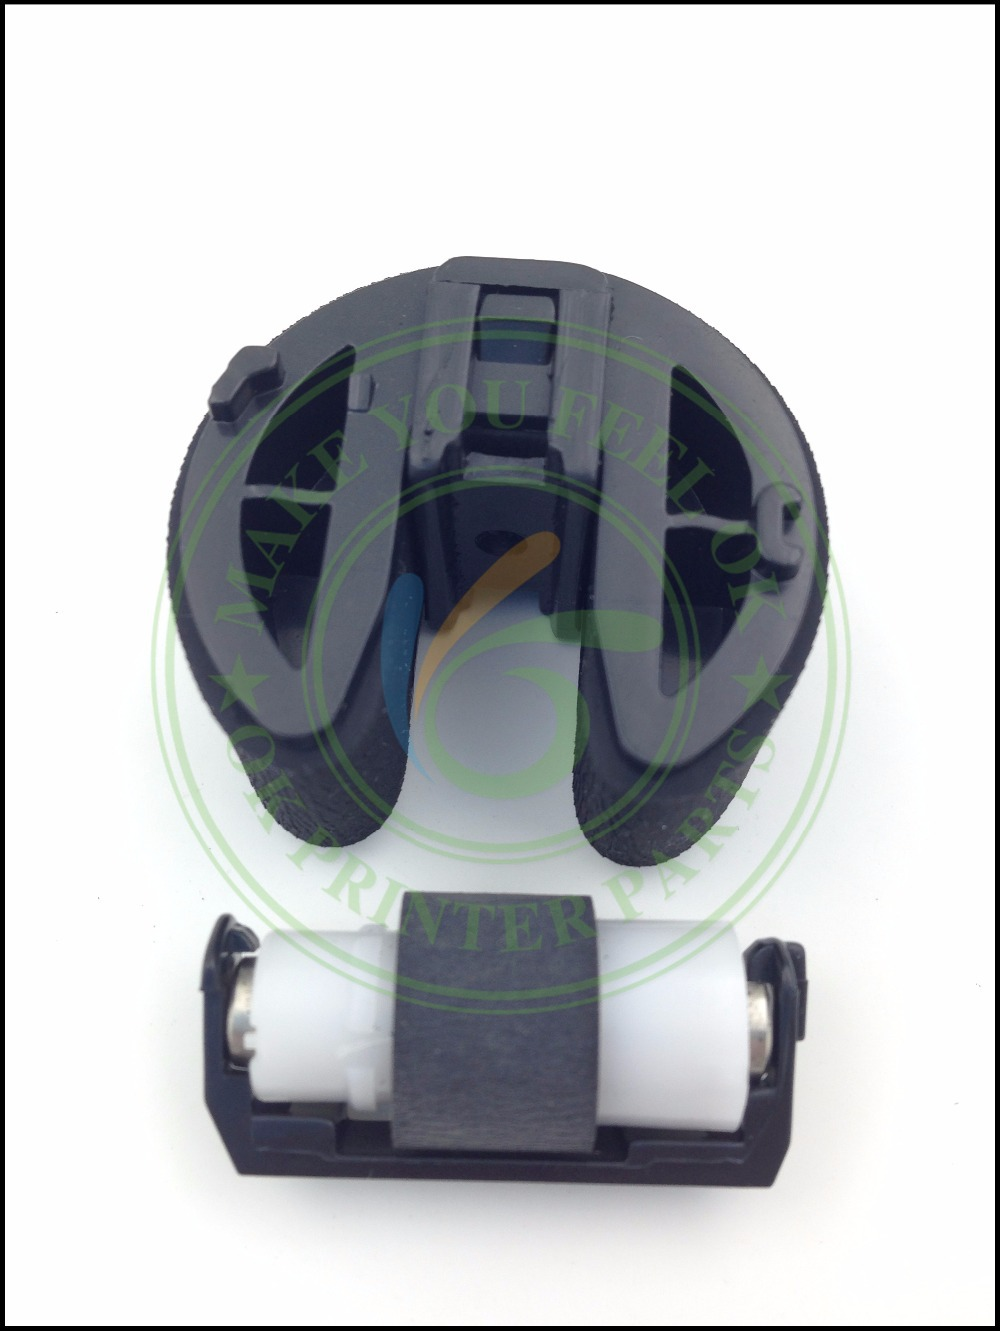 5X CC430-67901 RM1-4425 RM1-8765 RM1-4426 Pickup Roller For HP CM1312 CP1215 CP1515 CP1518 CM1415 CP1525 CP2025 CM2320 M251 M351